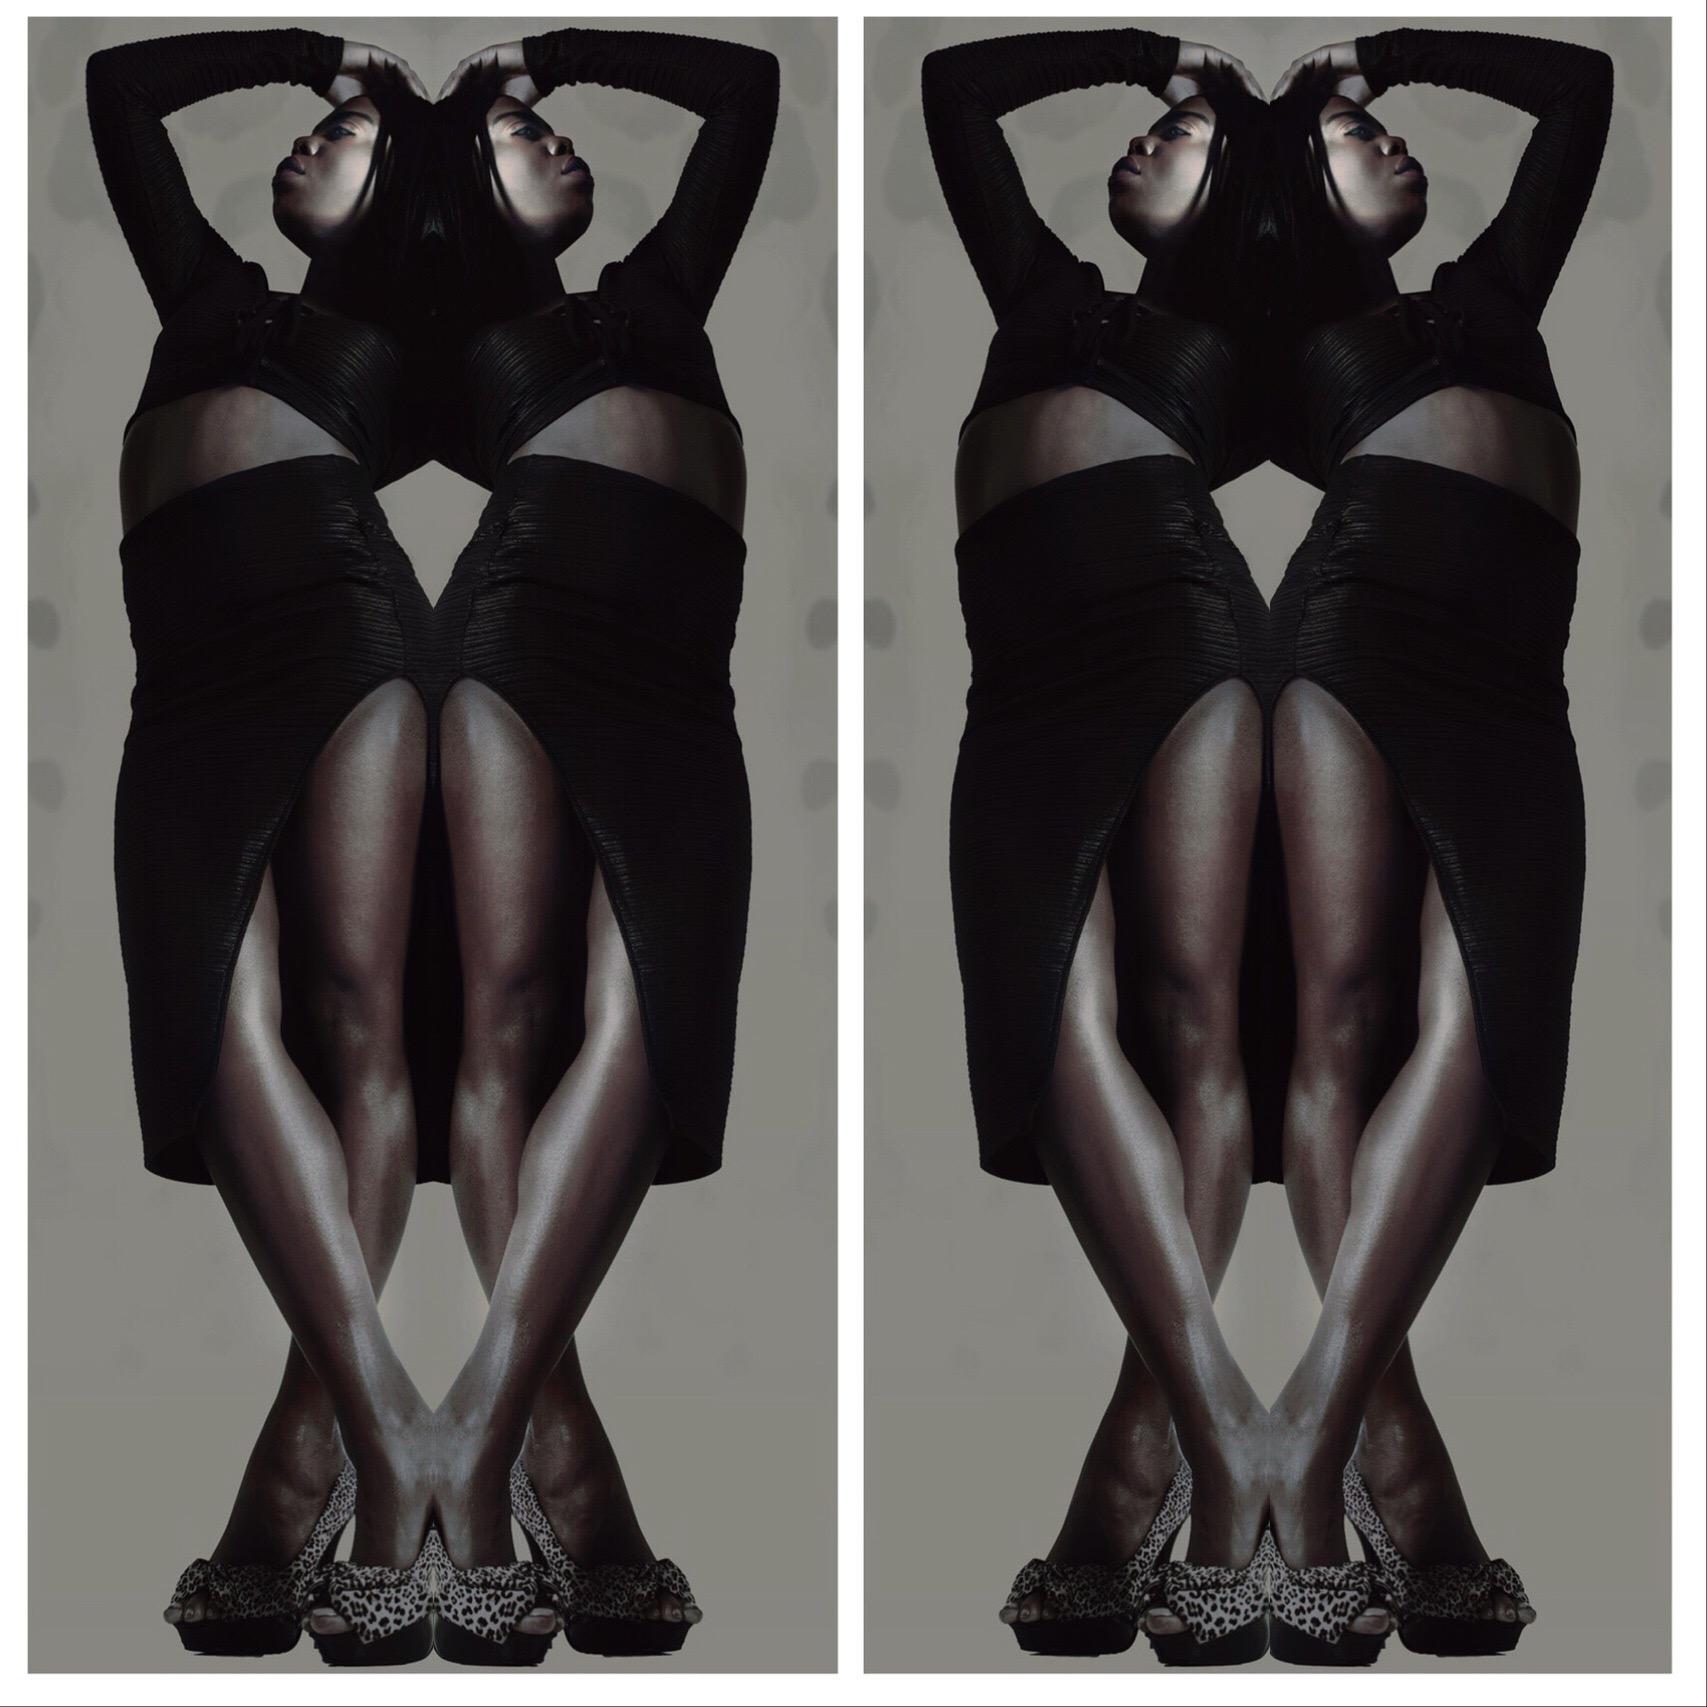 K.G.Sexy.Collage4.jpeg